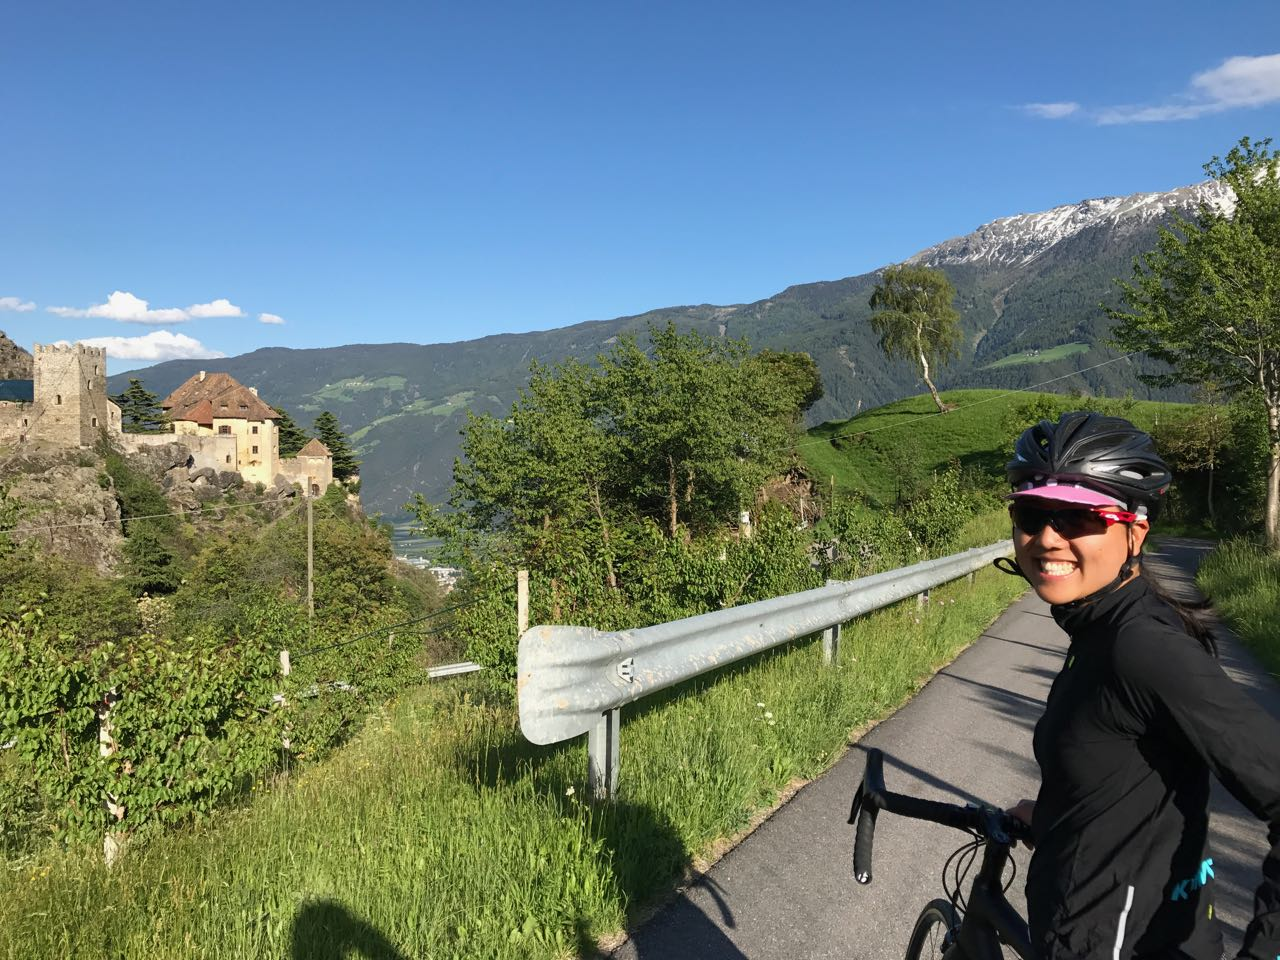 Rennradtour Vinschgau / Burg Juval